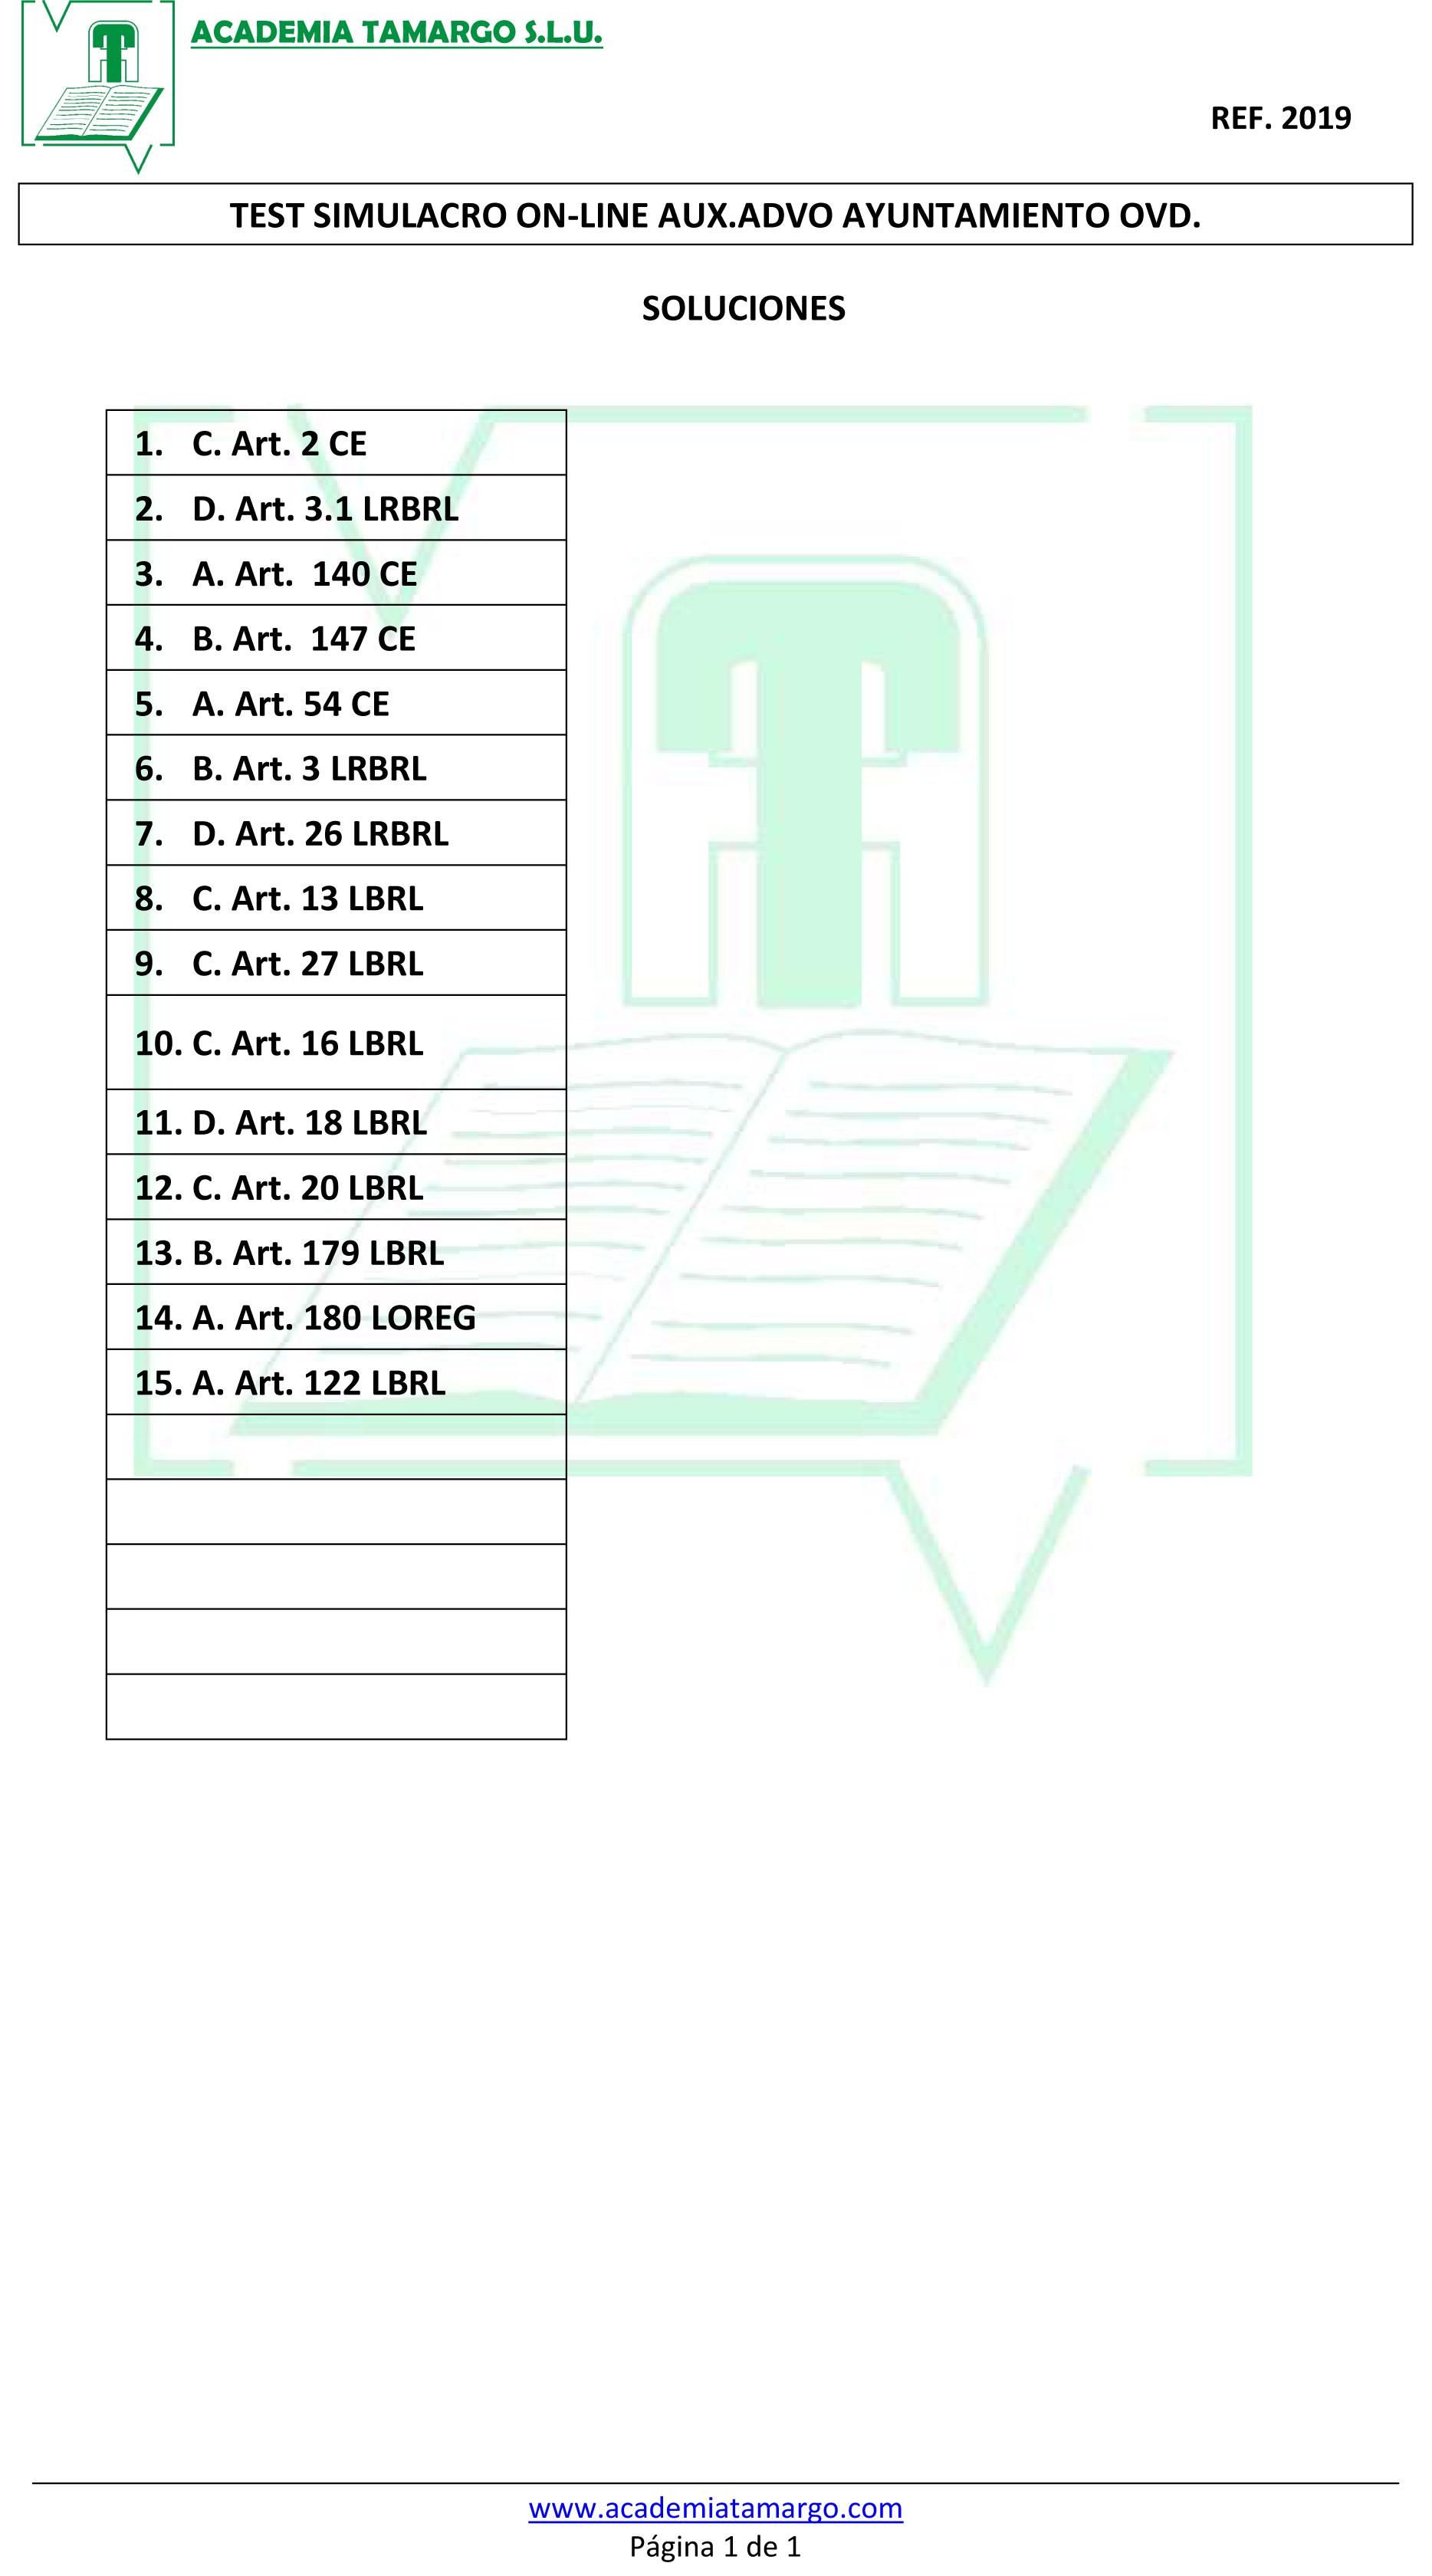 Microsoft Word – SIMULACRO ON-LINE AYUNTAMIENTO OVIEDO_solucione